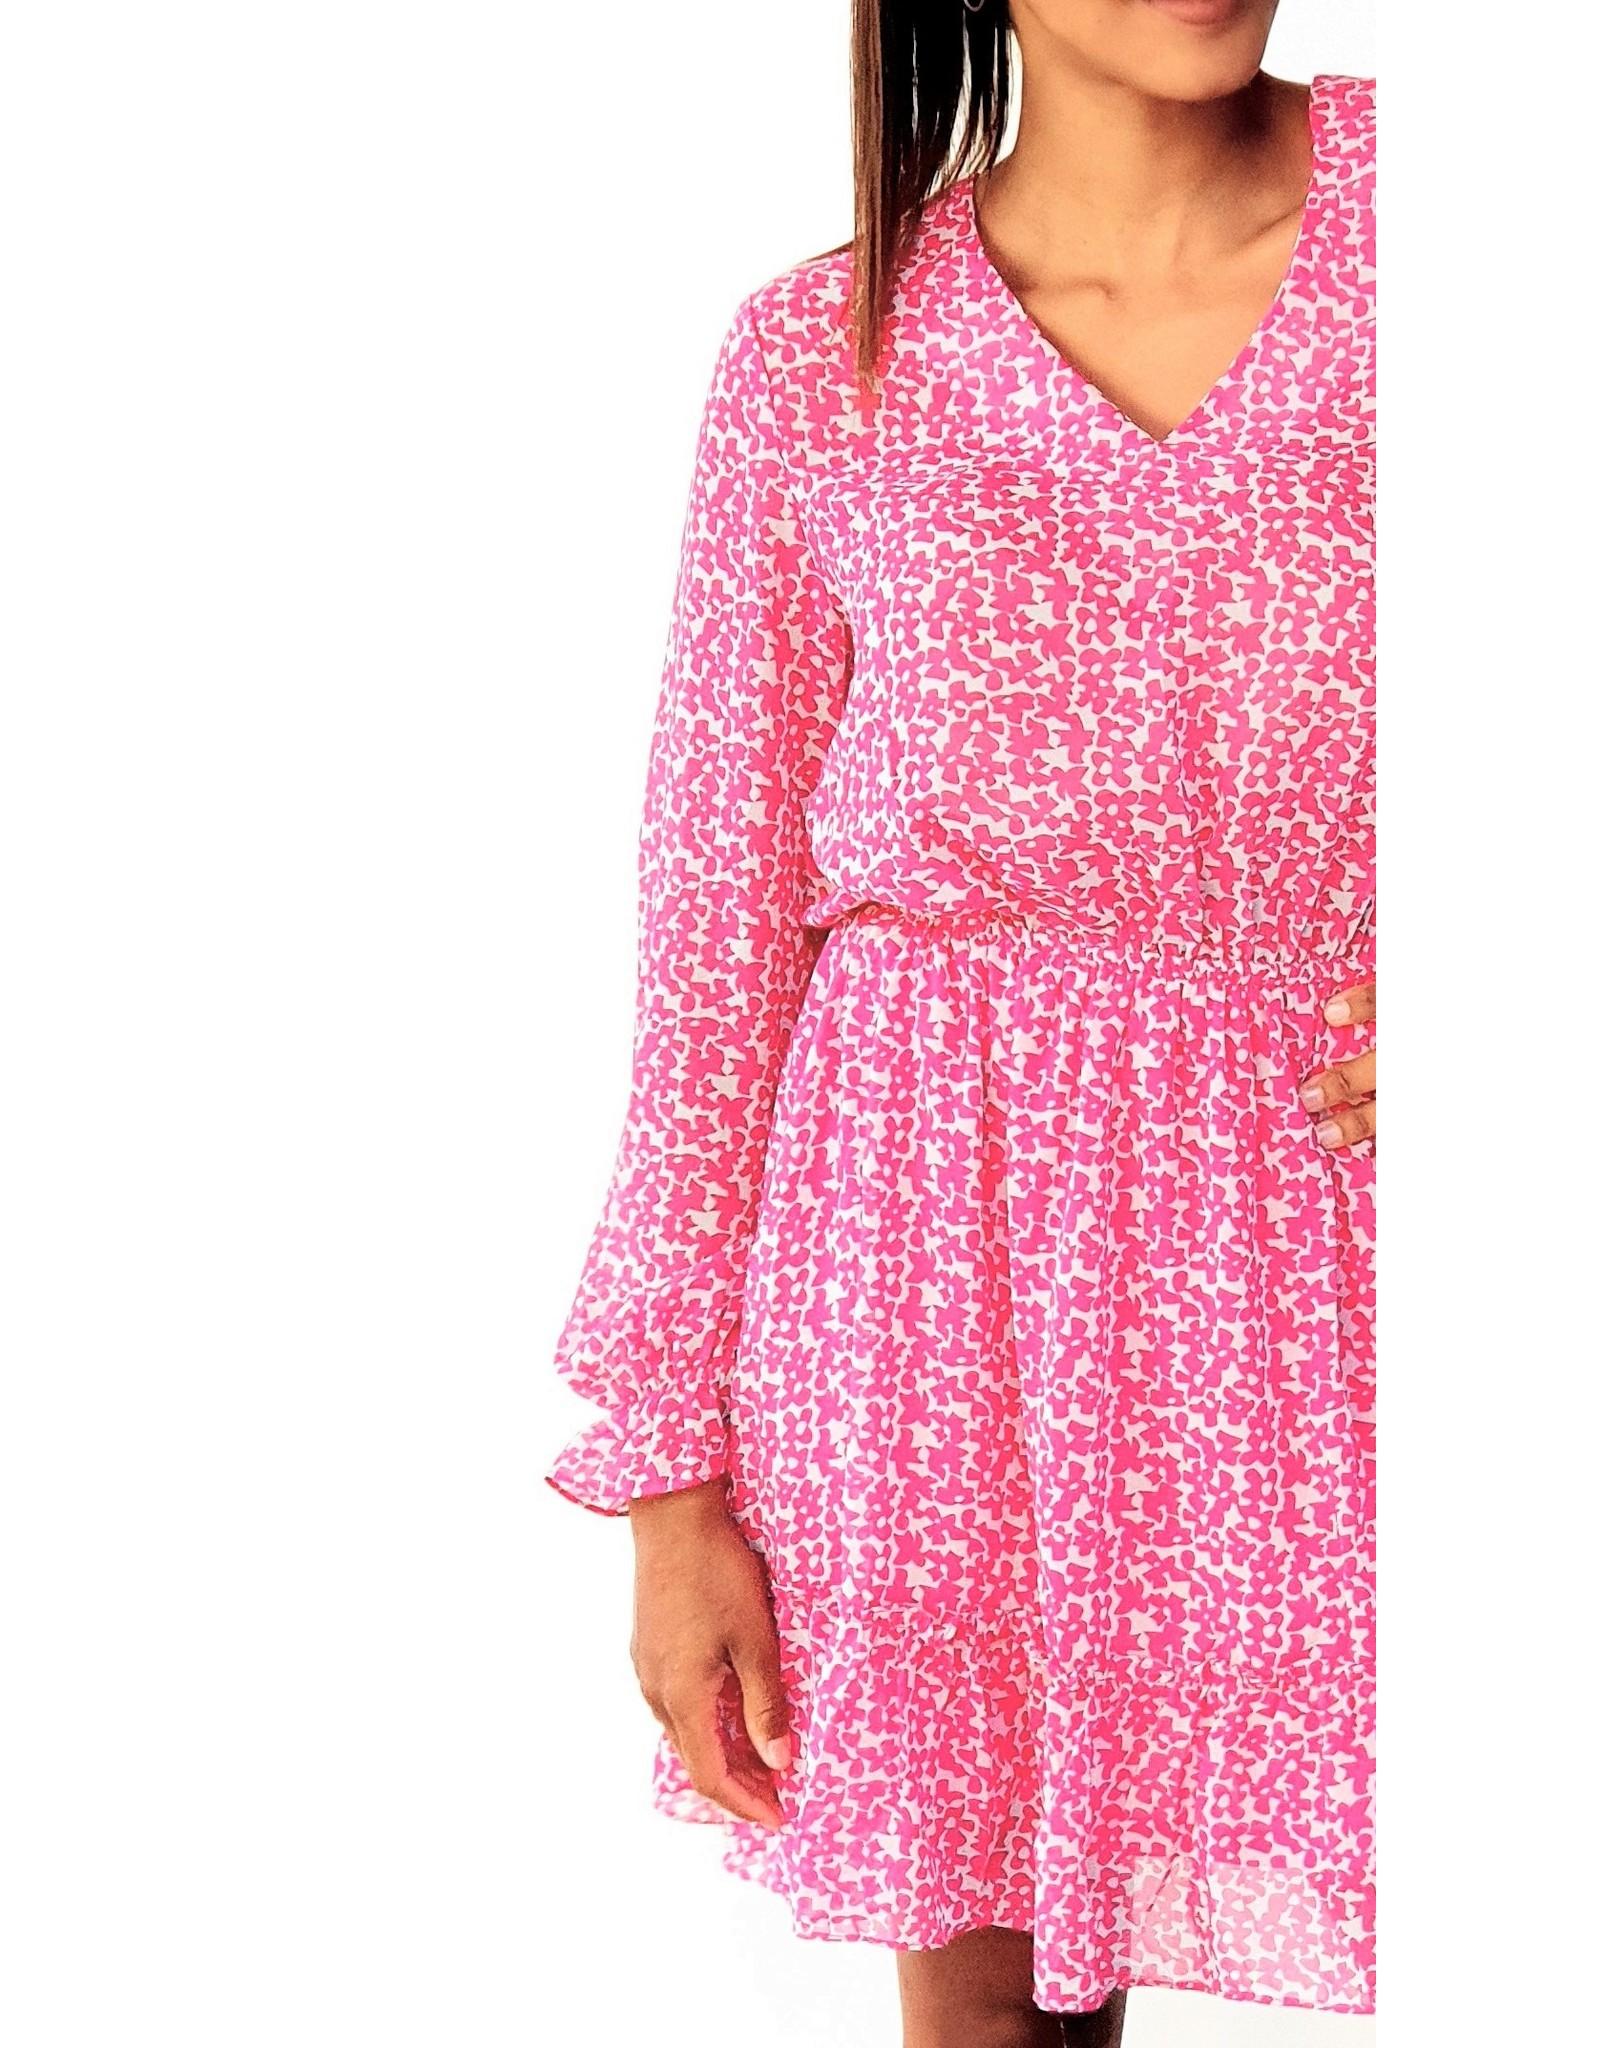 Thé fushia summer dress